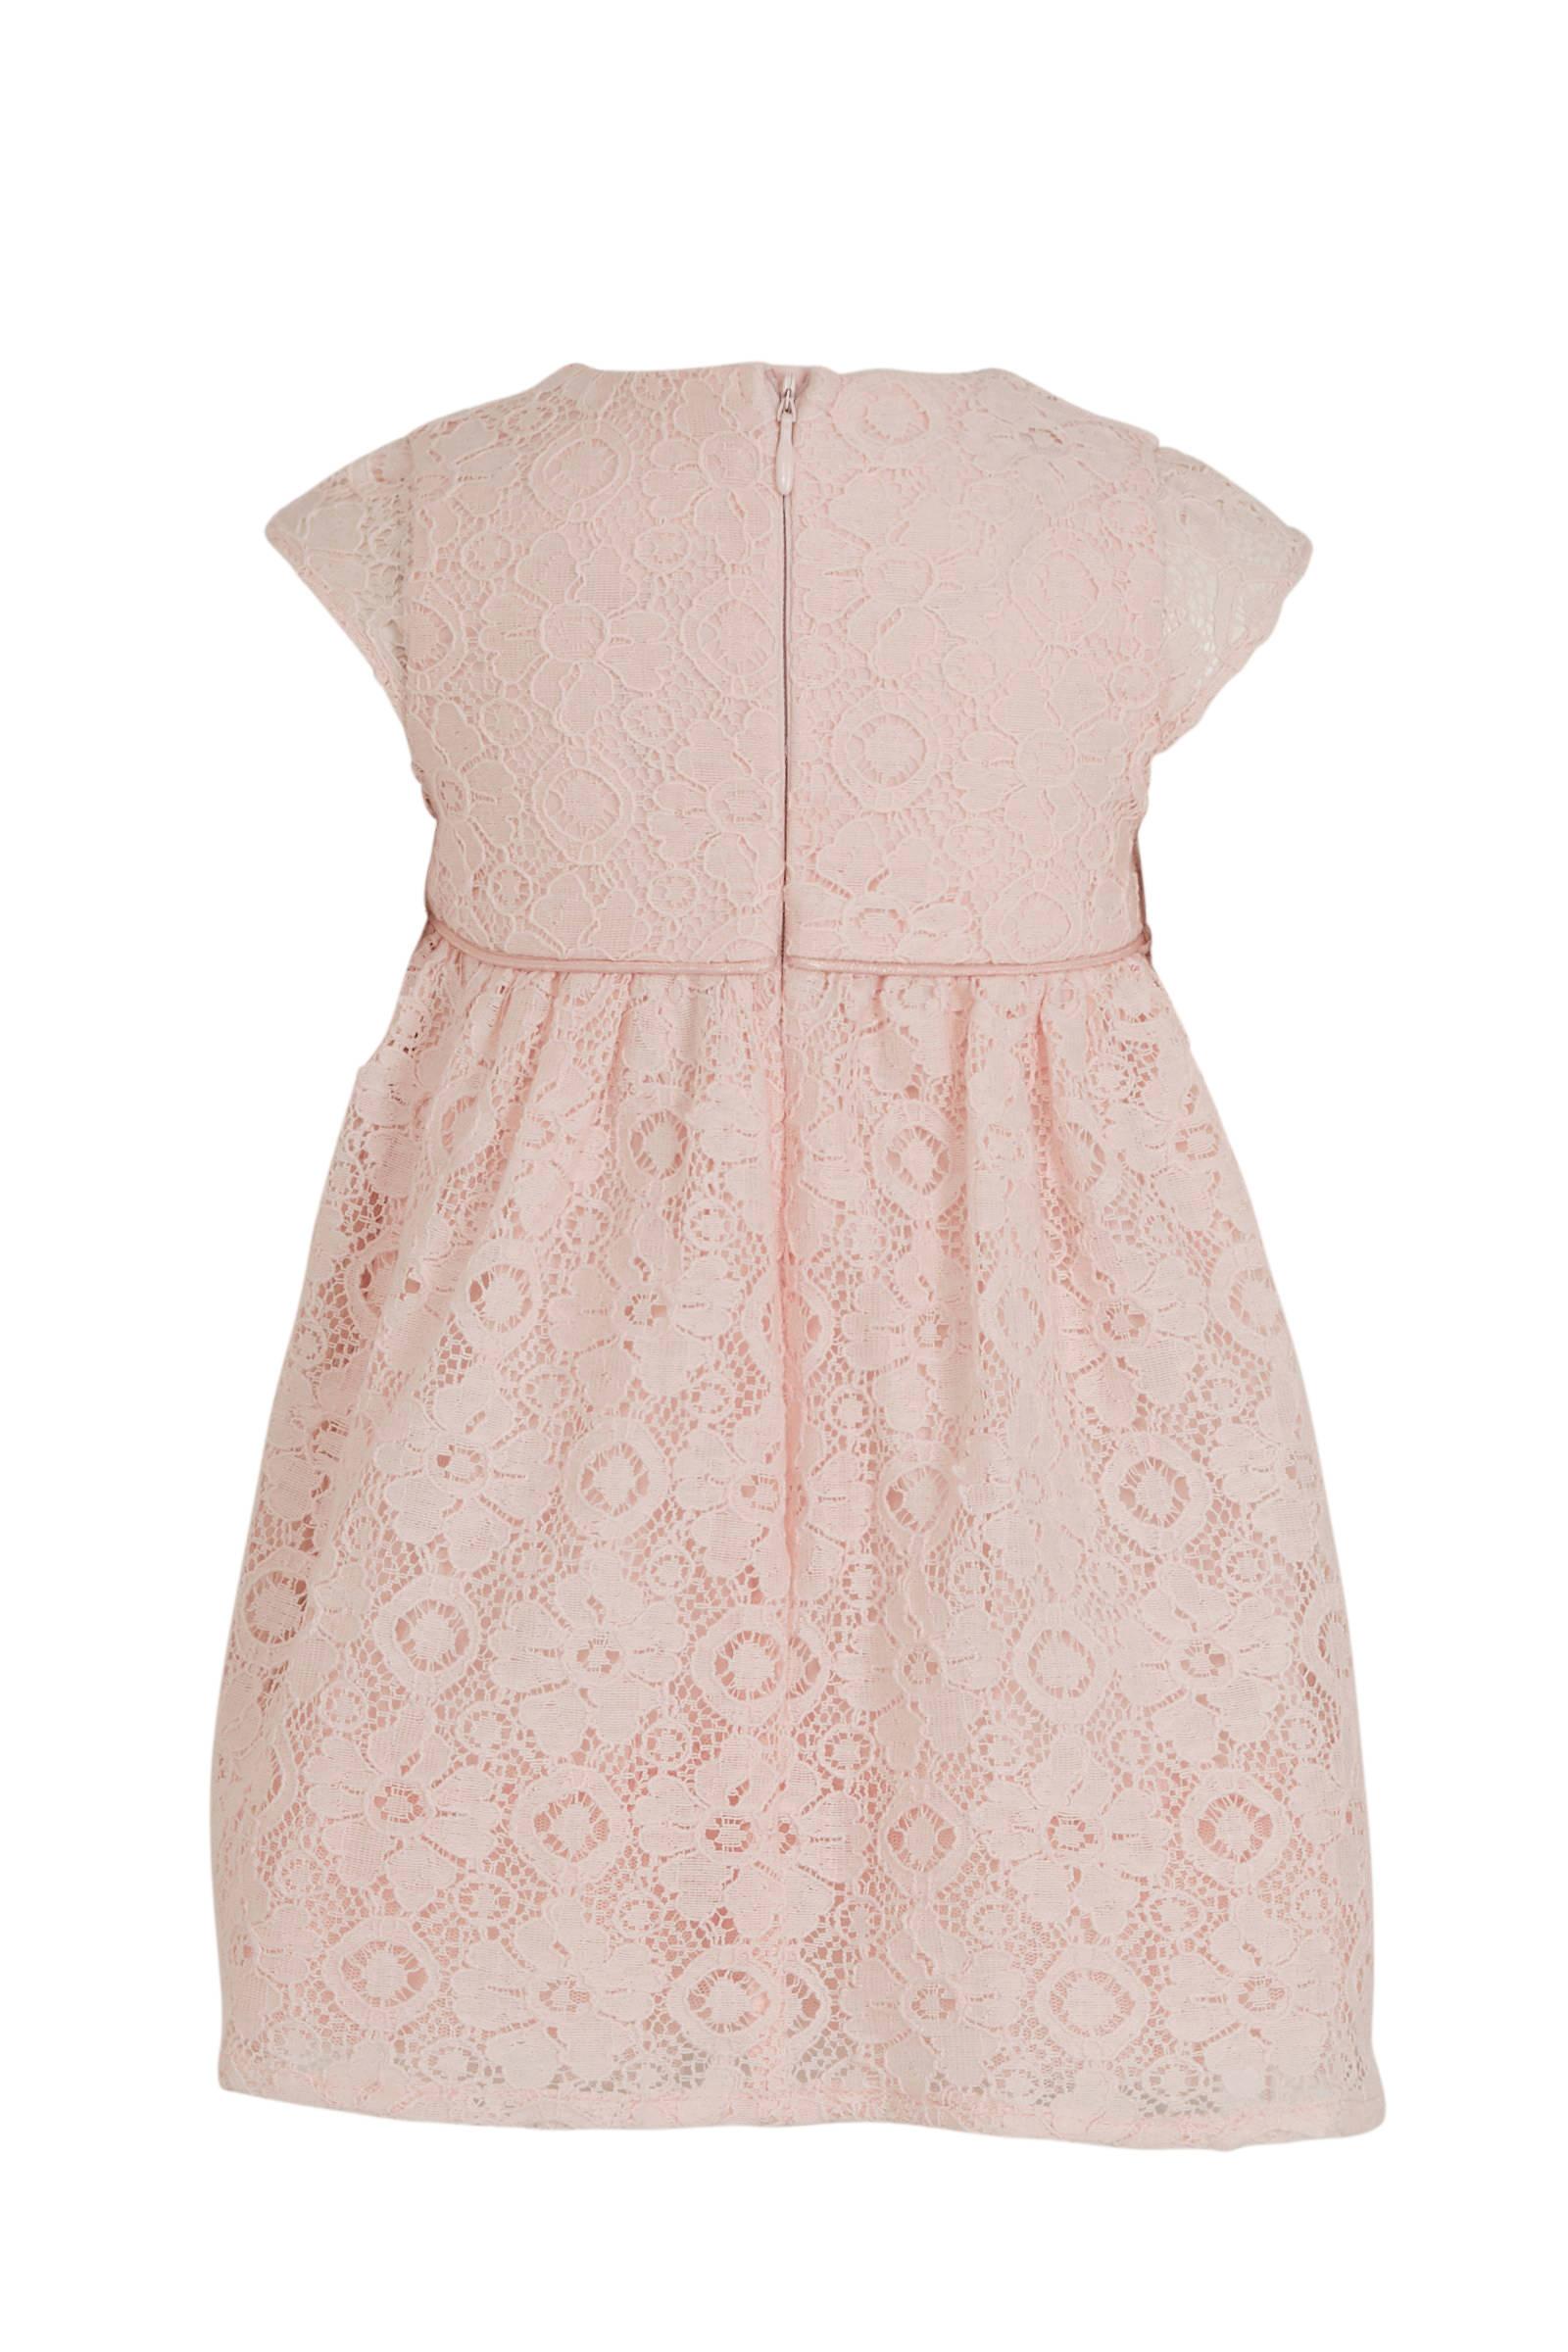 Ongebruikt C&A Baby Club A-lijn jurk en kant roze | wehkamp YE-22